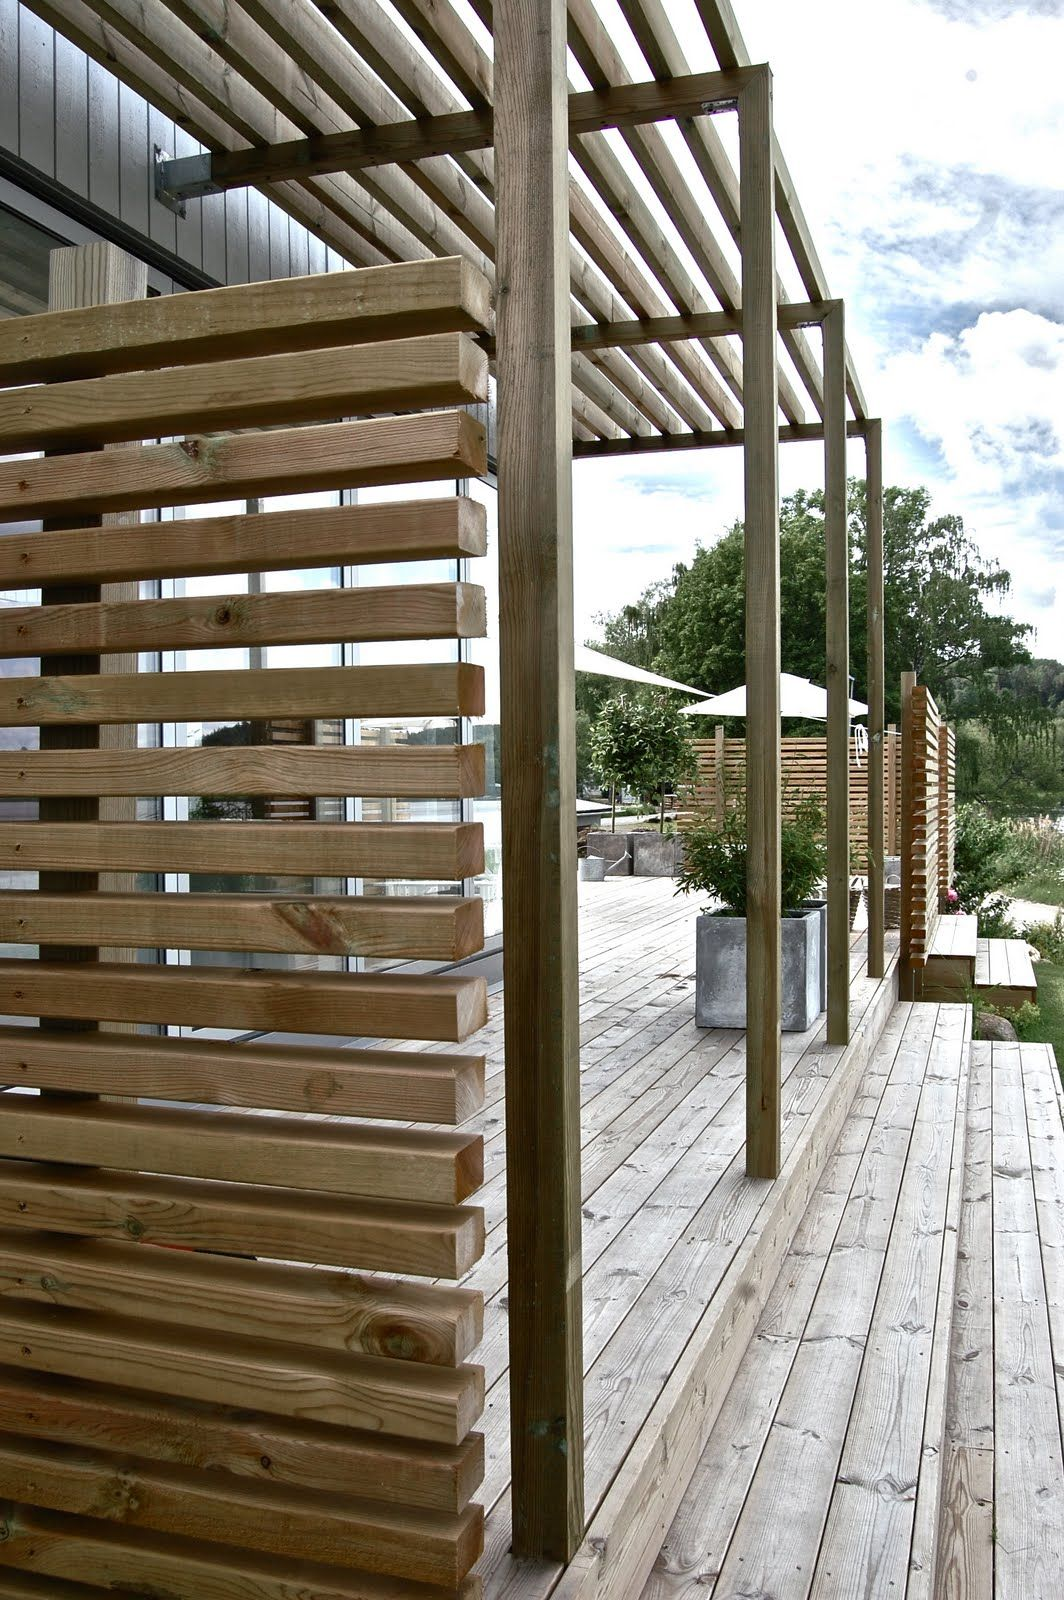 contemporary horizontal fencing Grafitgrå: En liten förstatitt... maybe we need to build something like this to hold up the honeysuckles